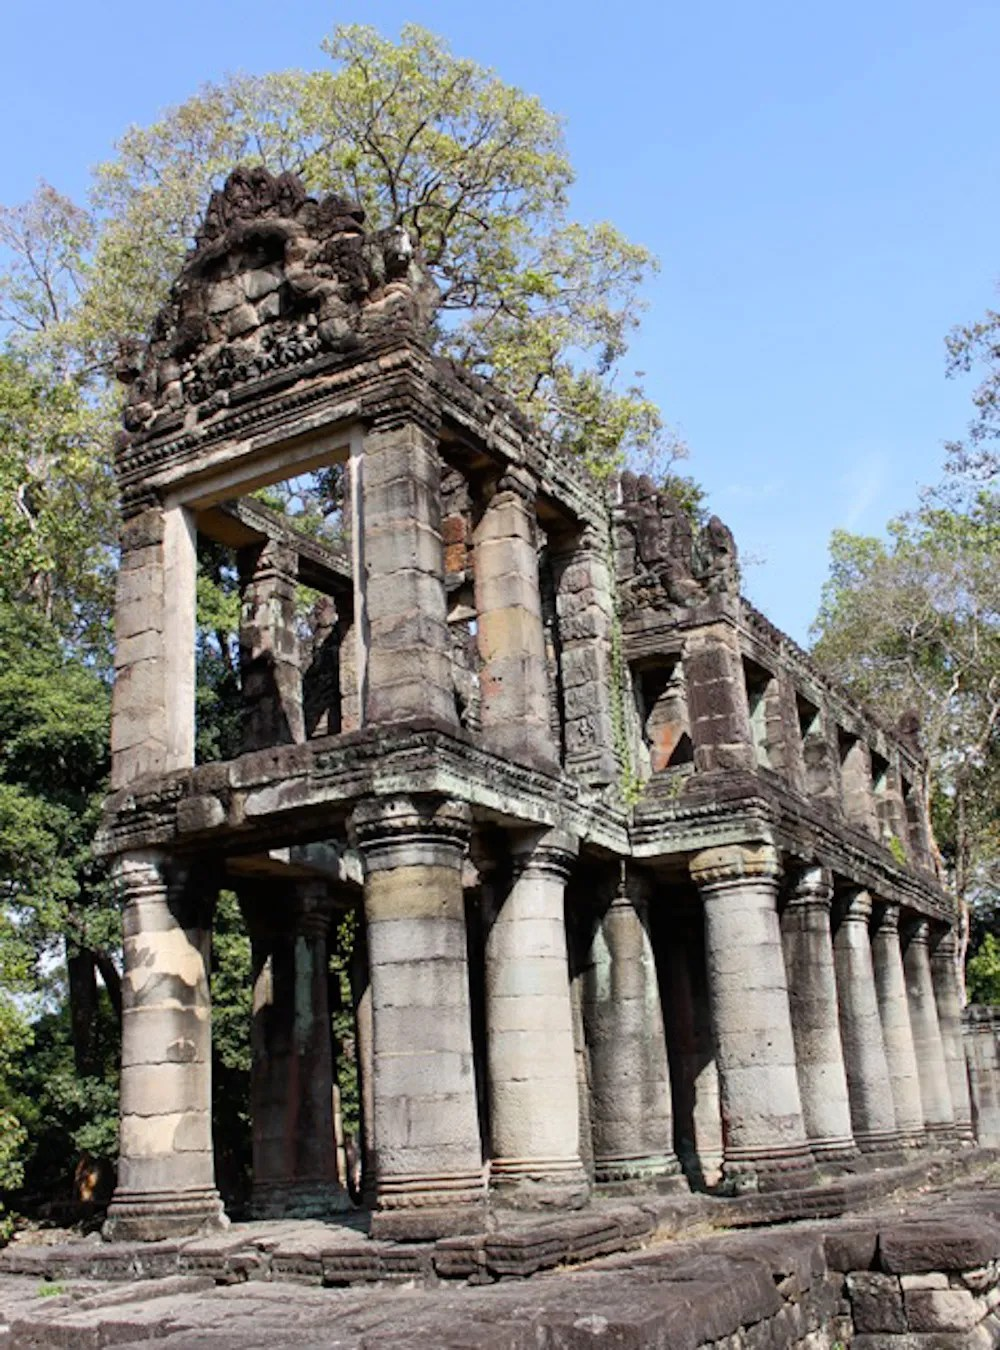 Preah Khan Siem Reap Cambodia 2-2